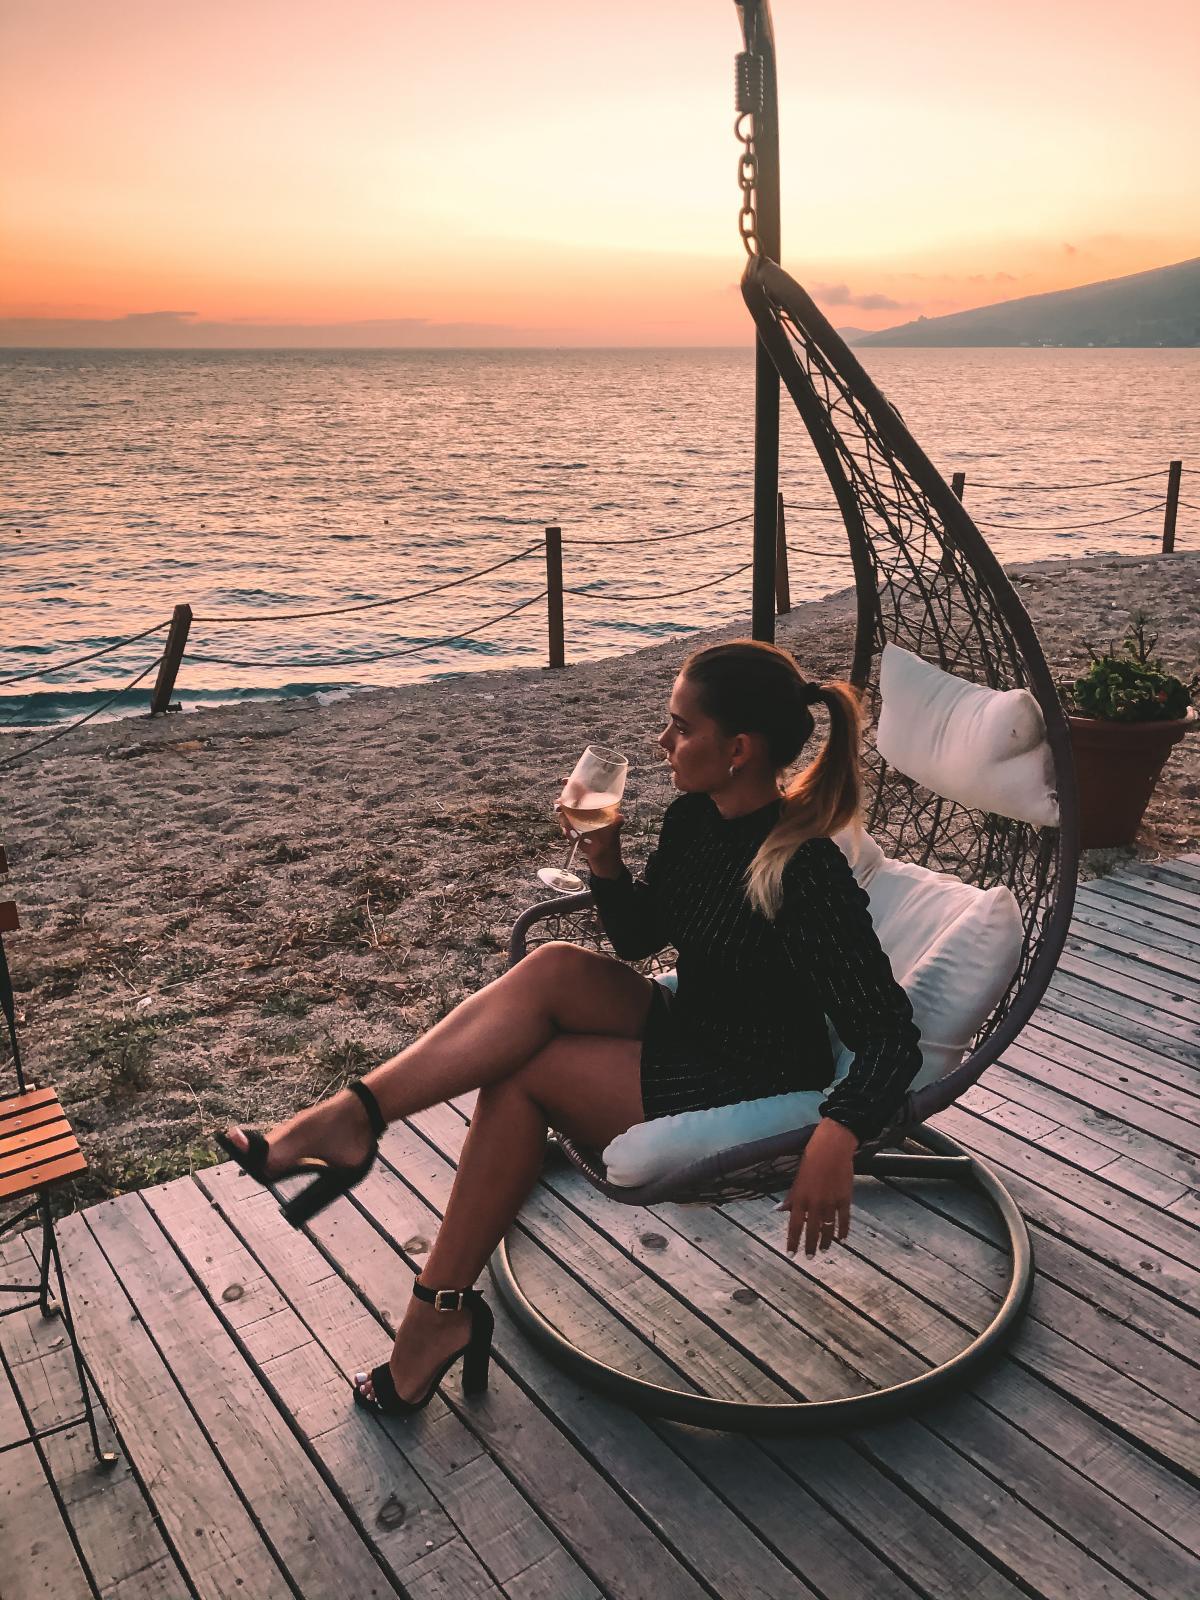 Вкуснейшее вино на фоне потрясающих закатов в Албании / фото Лилия Прядко